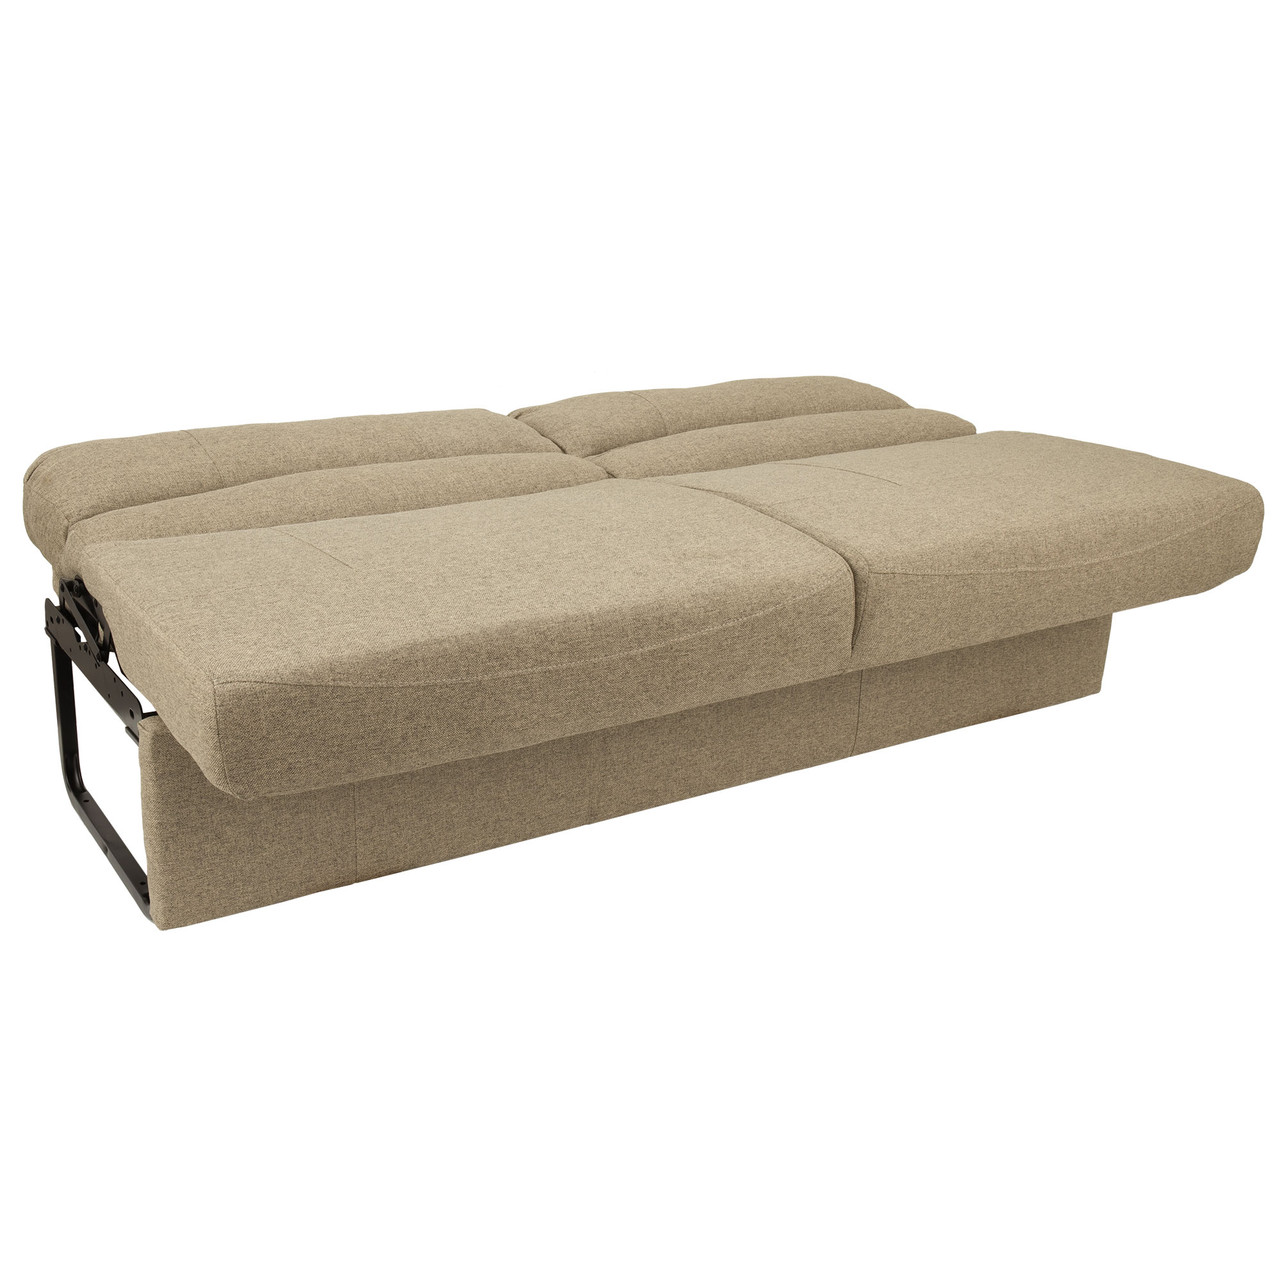 Awe Inspiring 72 Rv Jackknife Sleeper Sofa With Optional Legs Cloth Recpro Andrewgaddart Wooden Chair Designs For Living Room Andrewgaddartcom